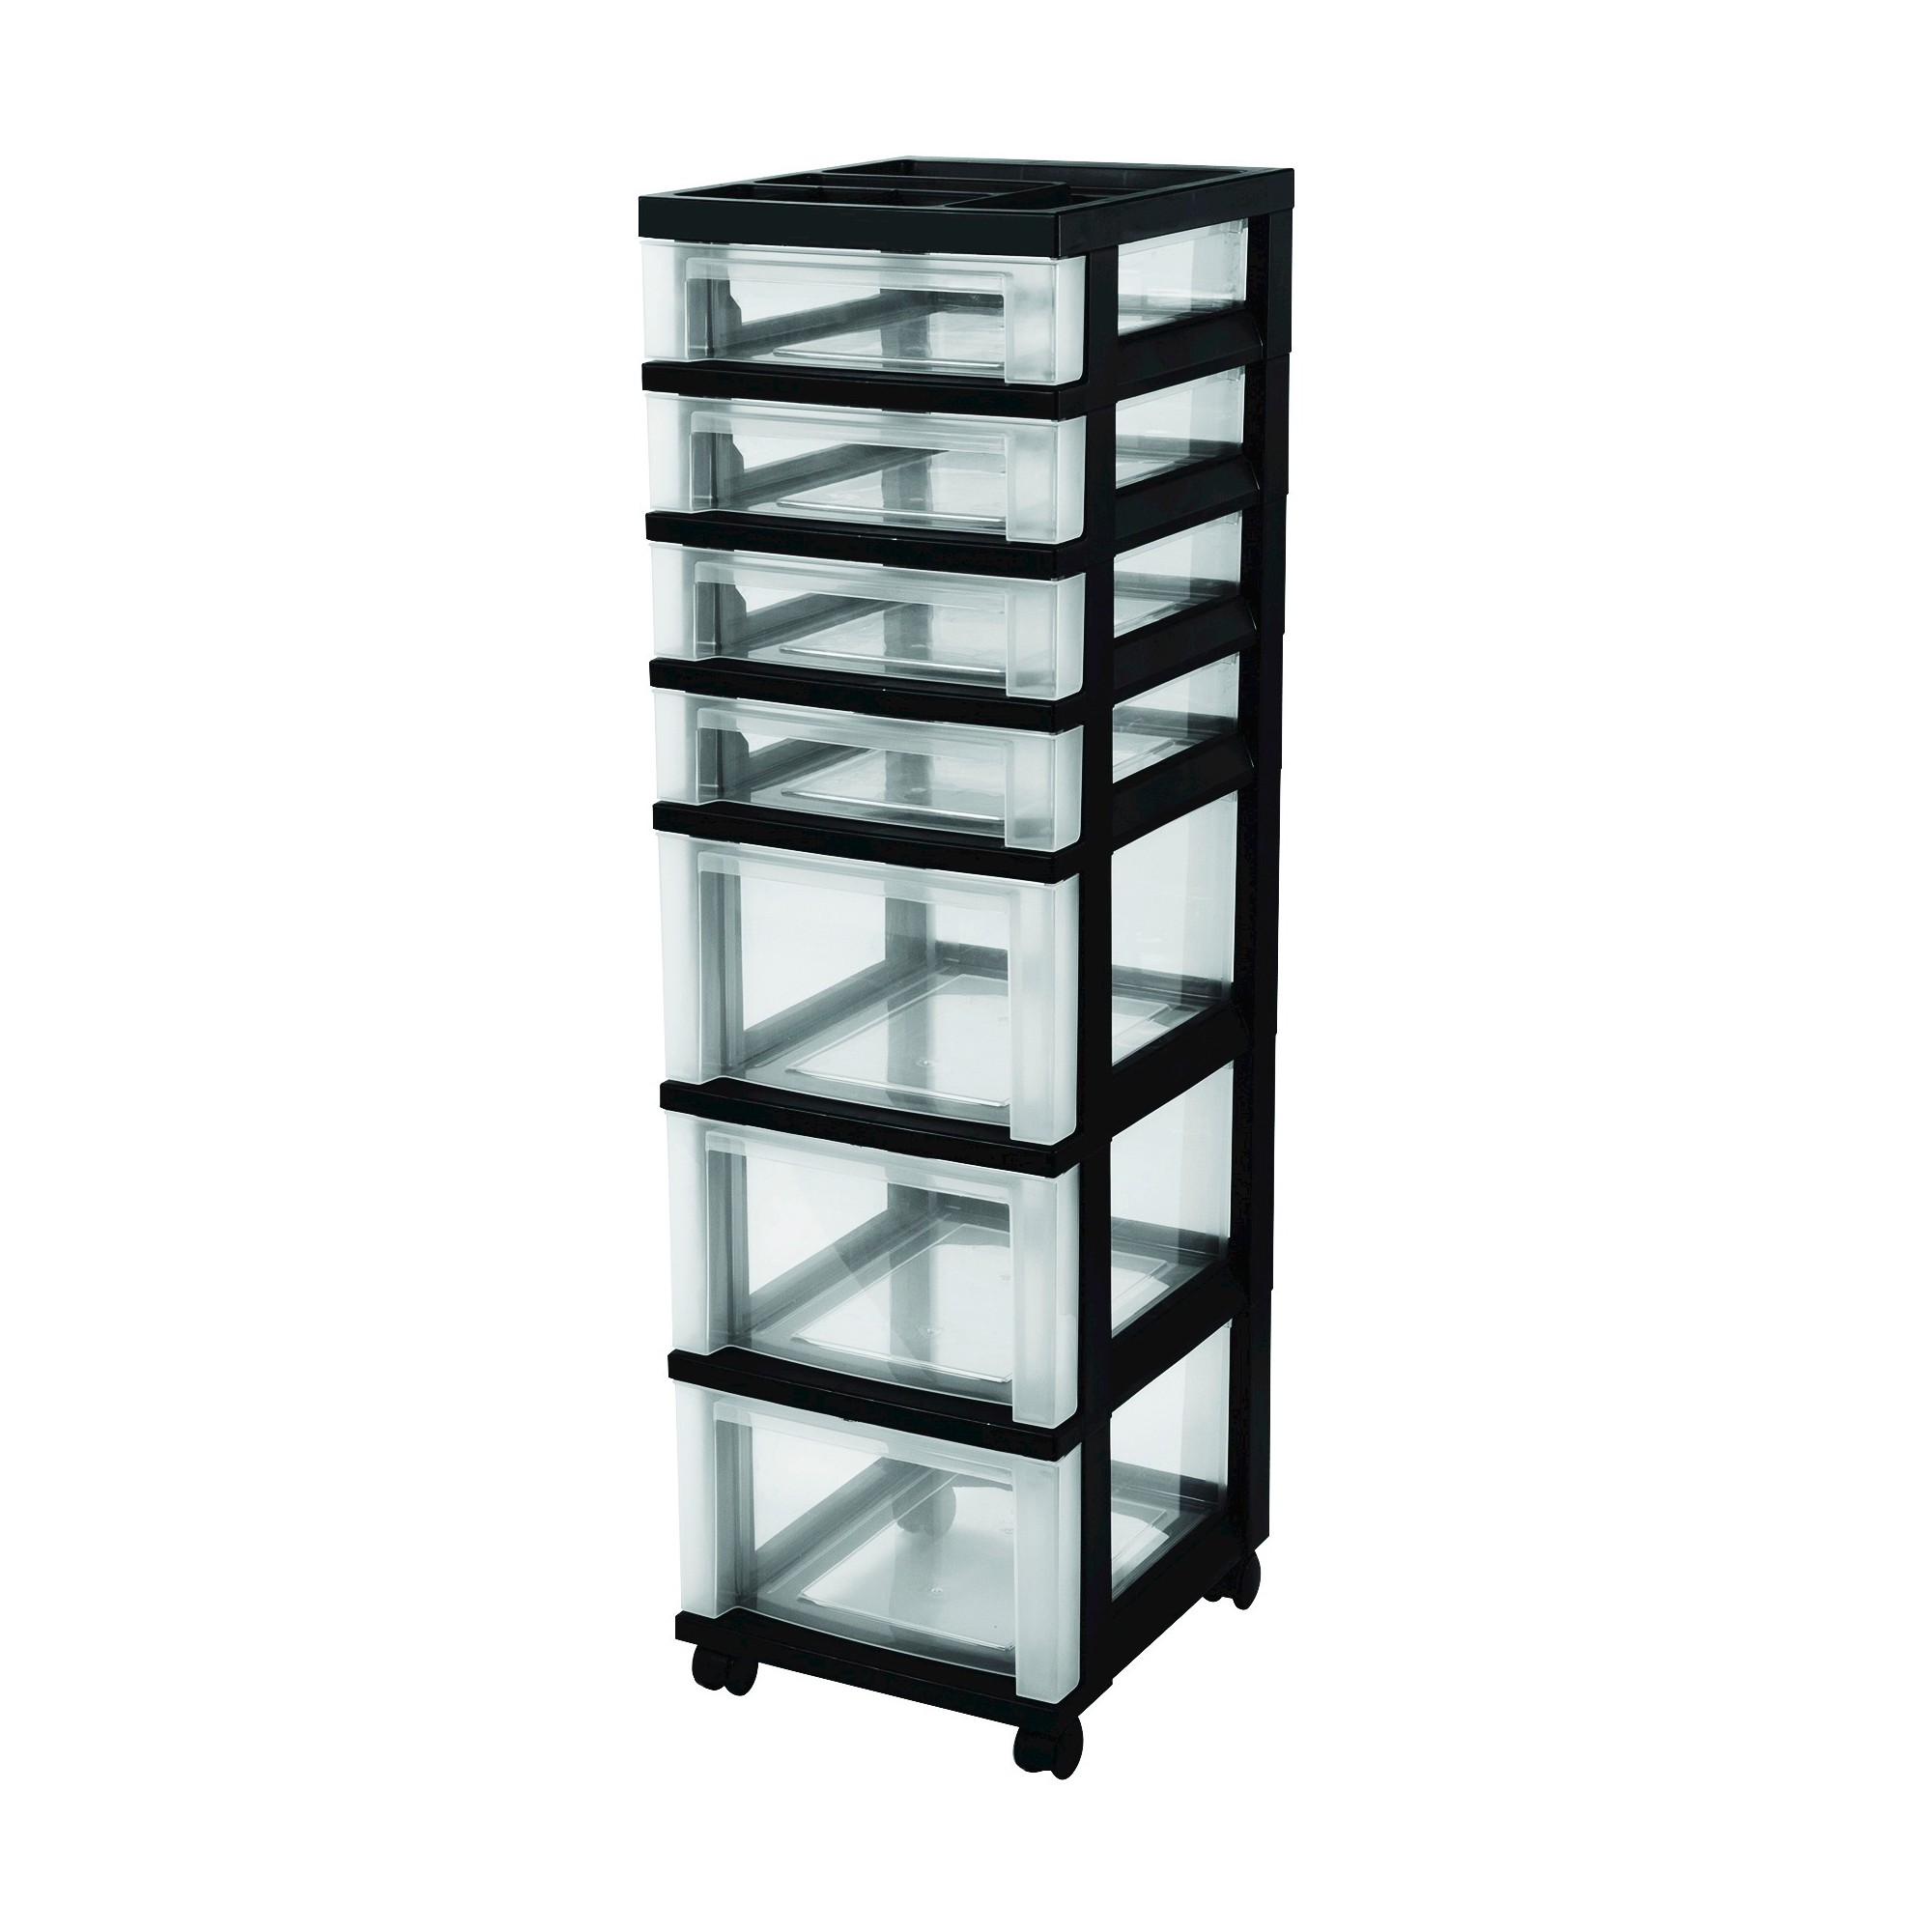 style xxx with cart original drawer com organizers luxury storage drawers bath bathroom cool eyagci